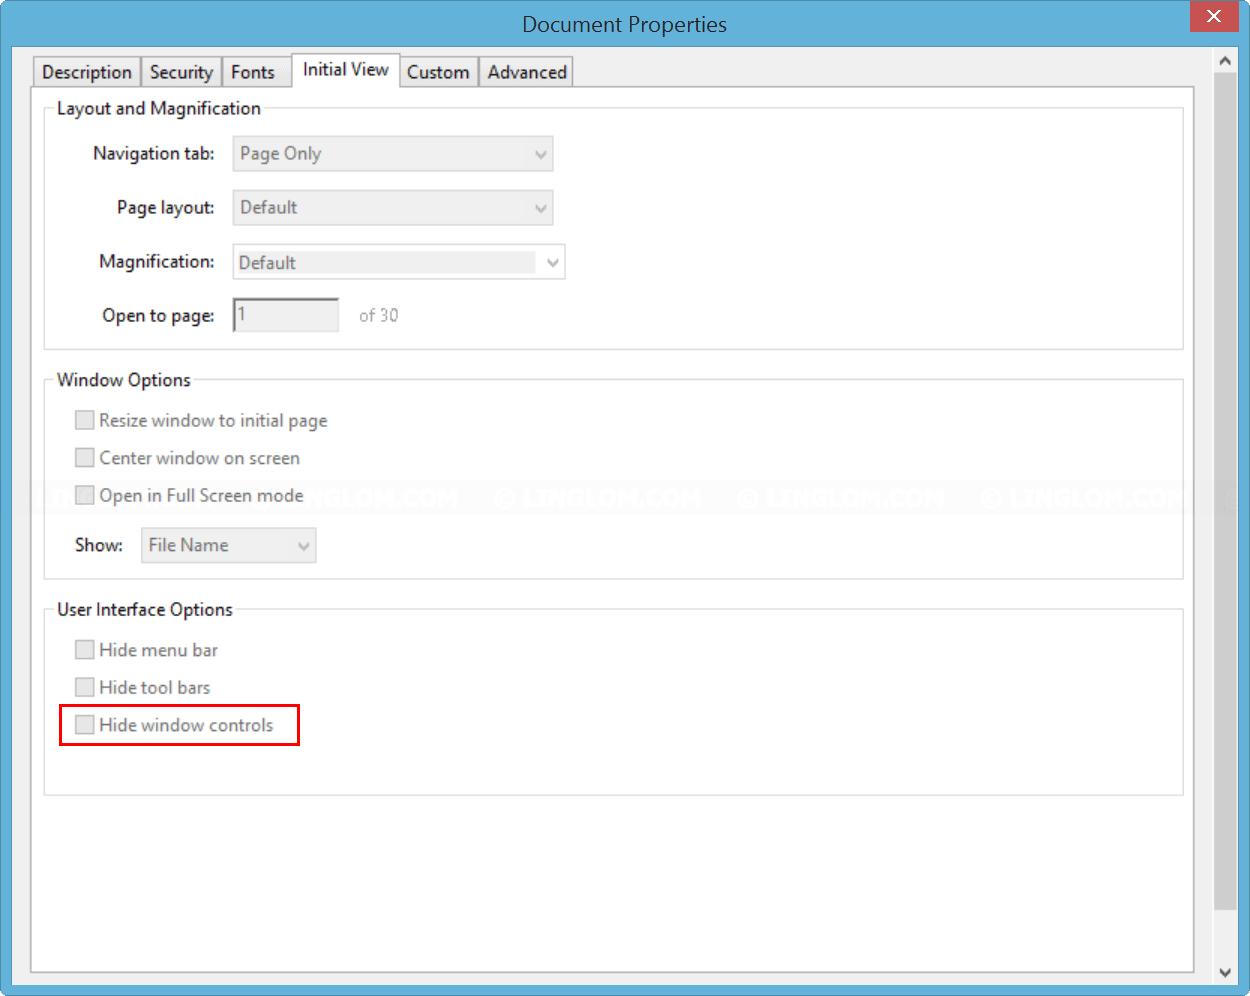 Document Properties on Adobe Acrobat